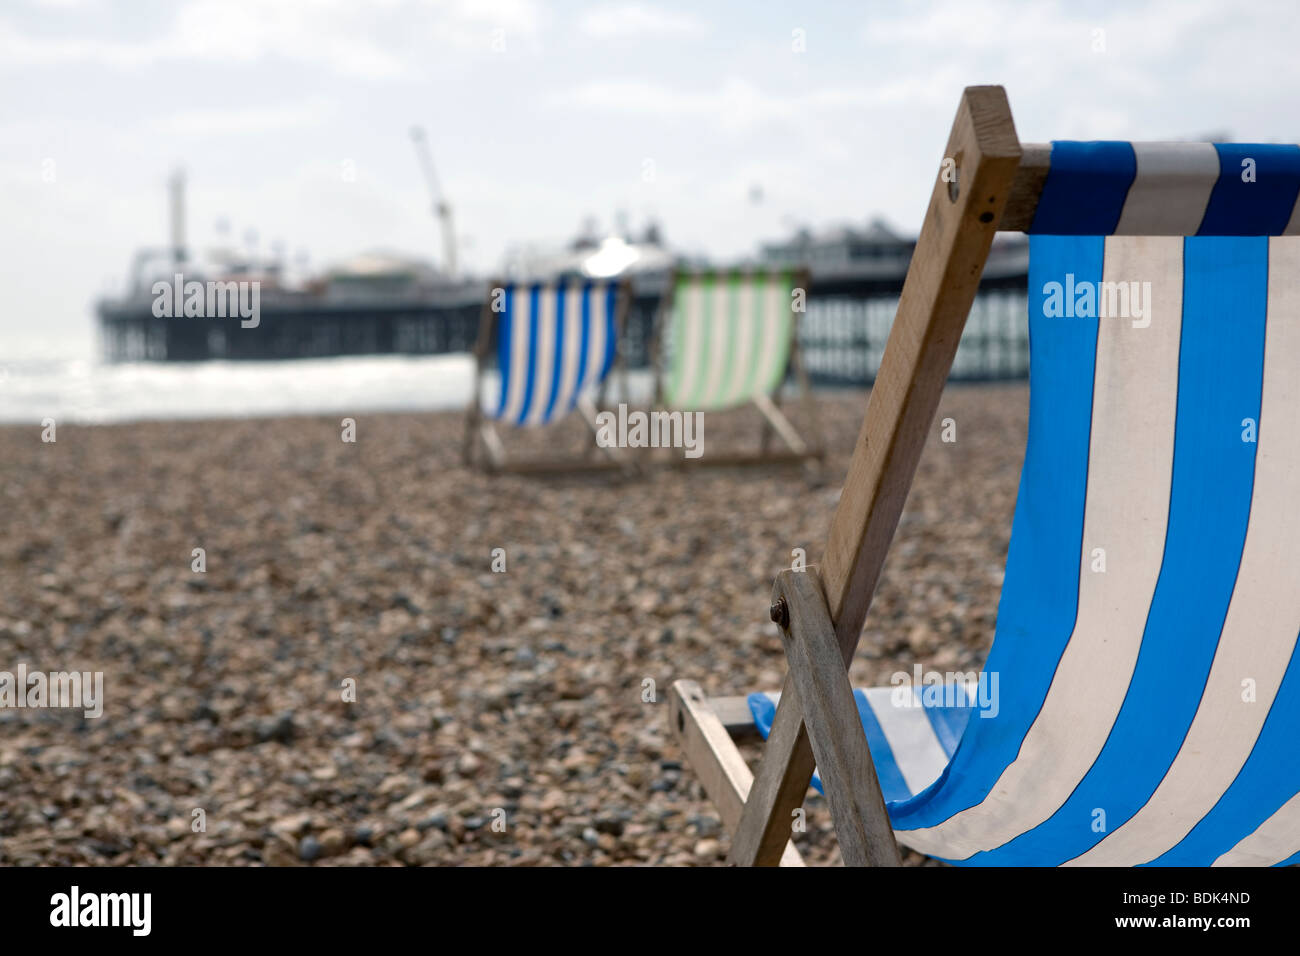 Deck chairs on Brighton beach. - Stock Image